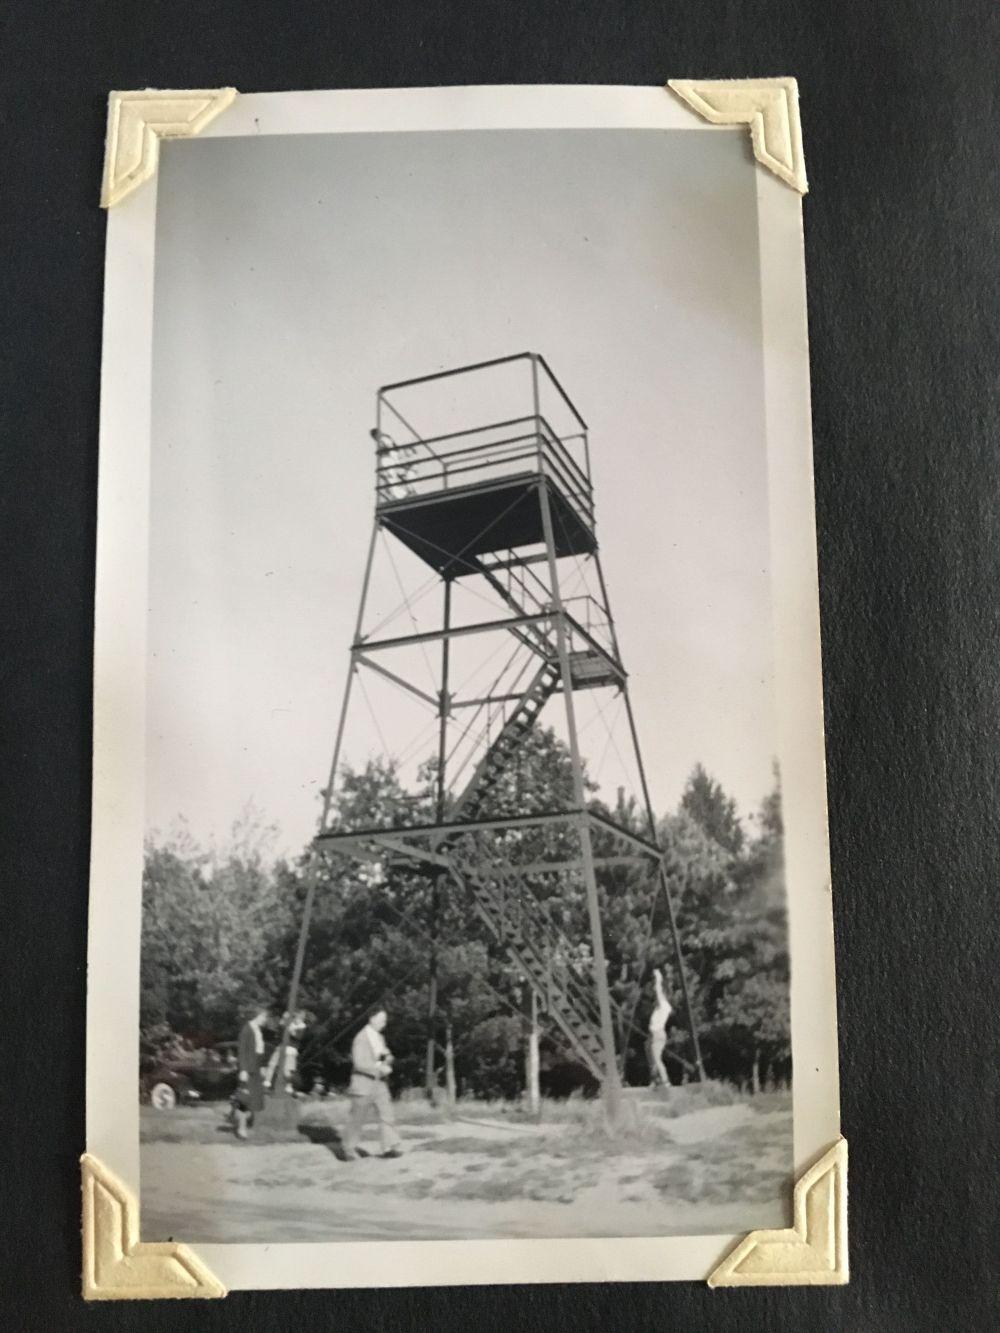 sept 22 1940